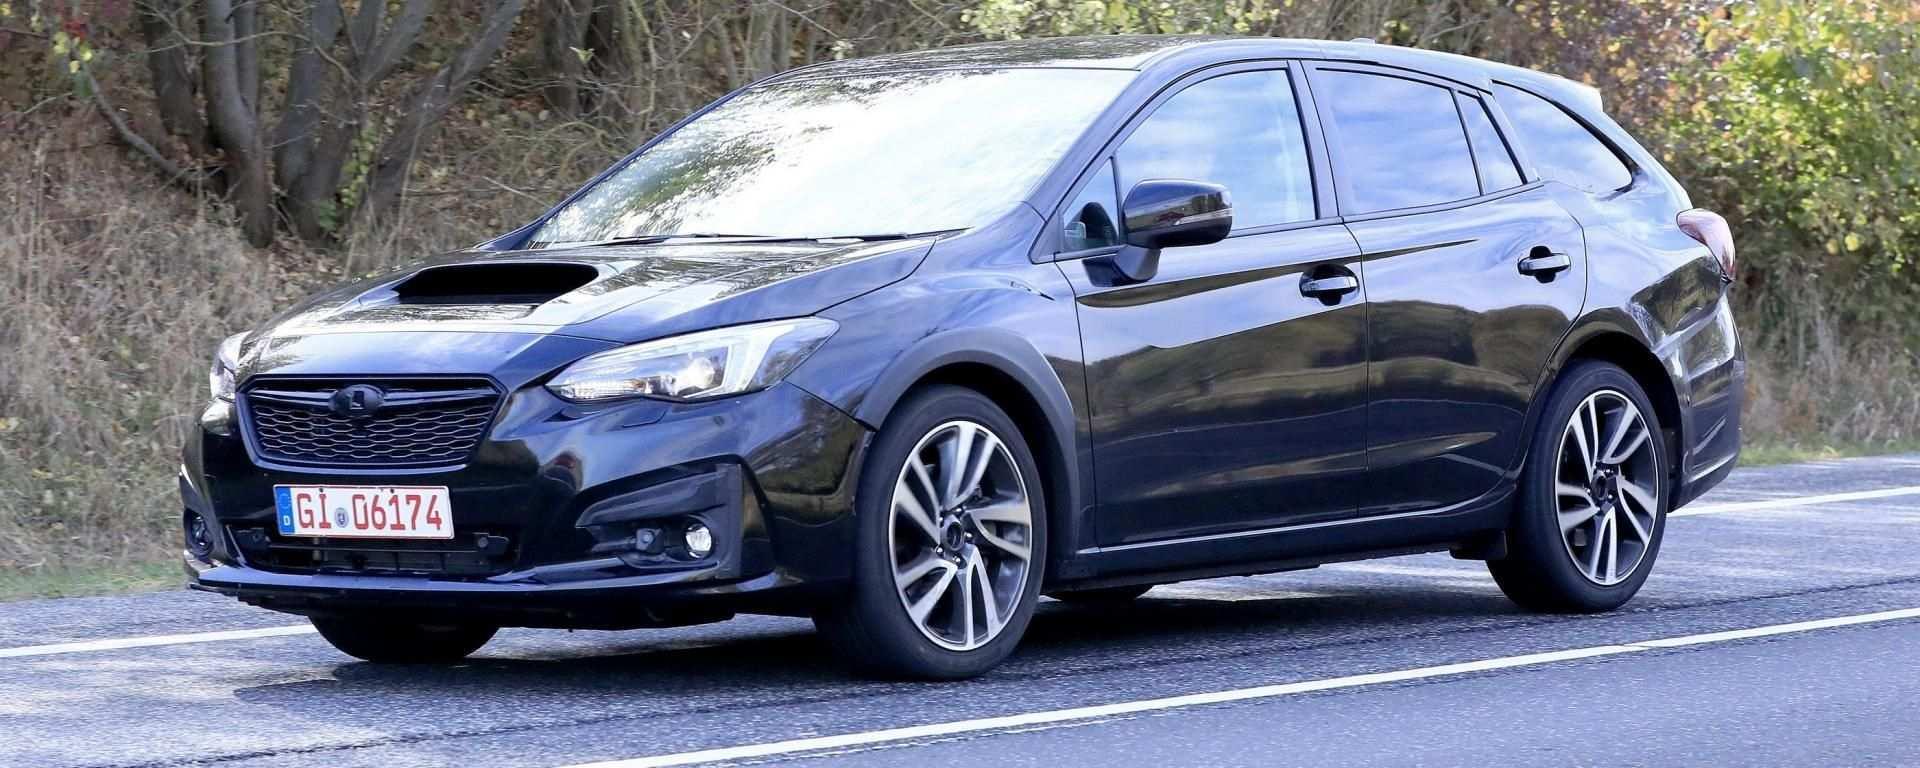 54 New Novita Subaru 2019 Images by Novita Subaru 2019